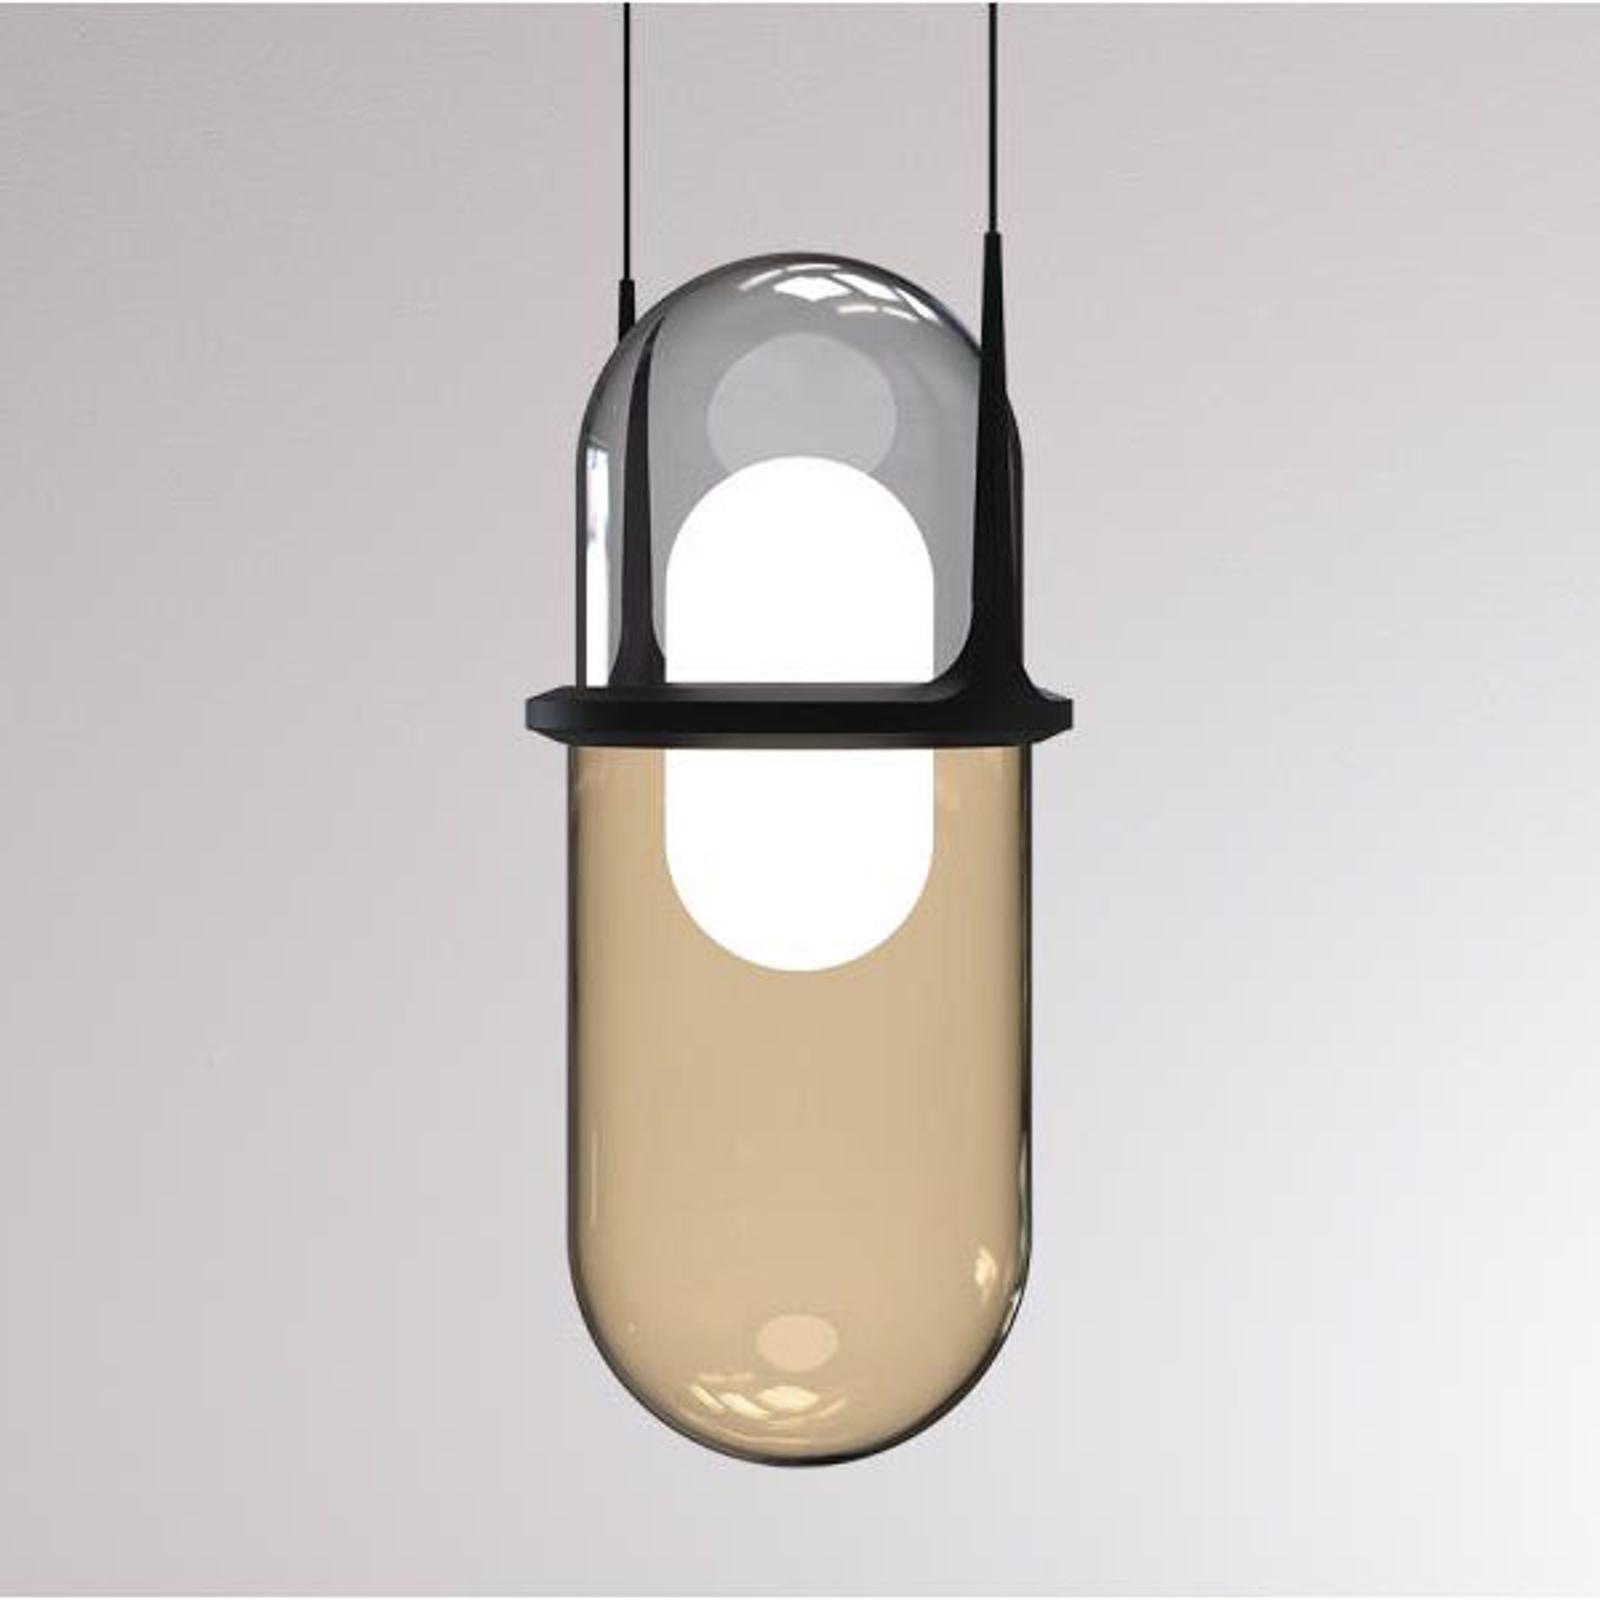 LOUM Pille lampa wisząca LED szara/szampan